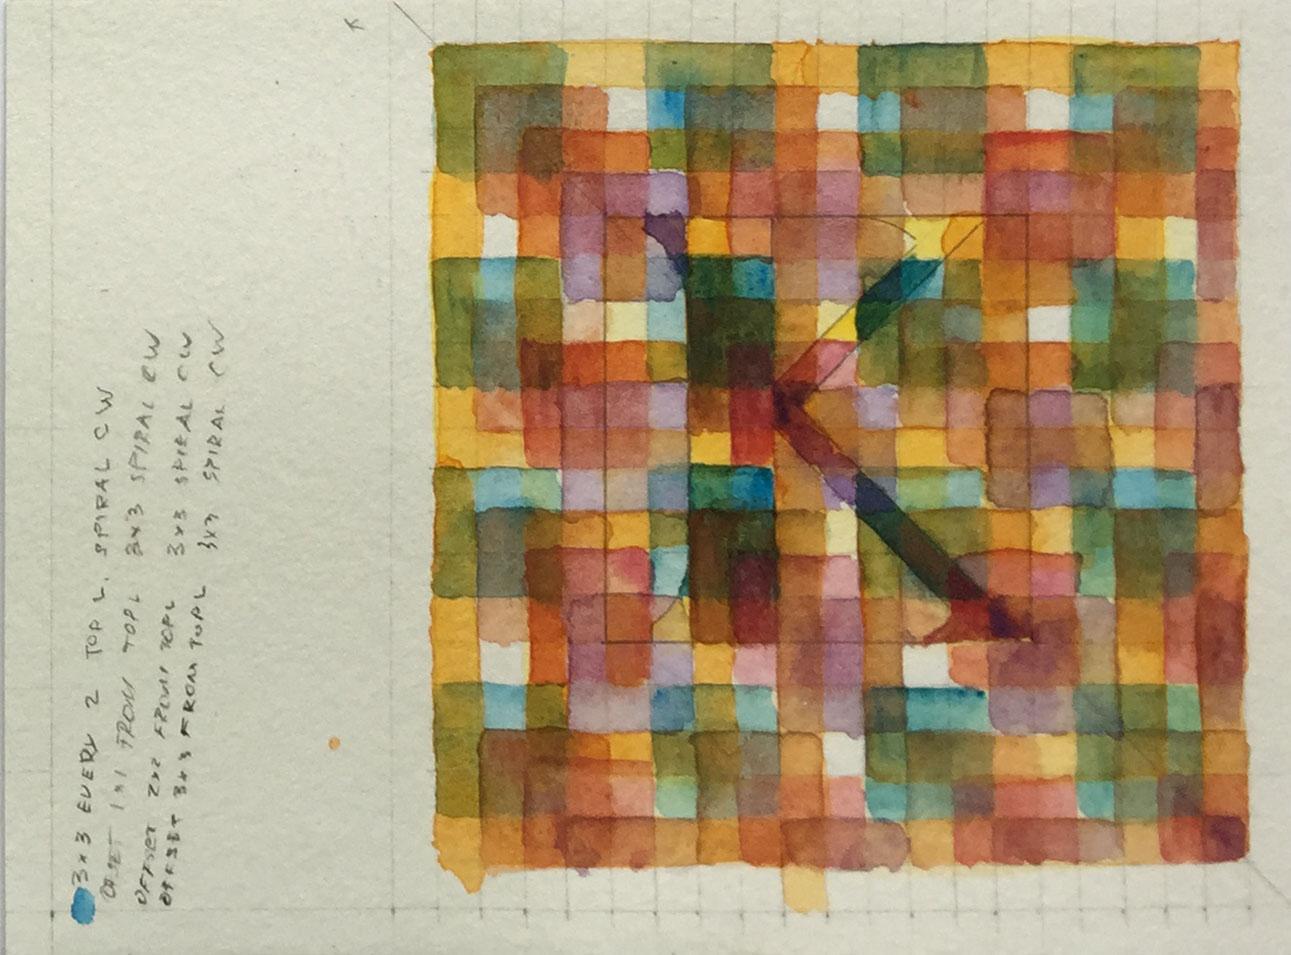 Alphabet_9-12 6.jpg